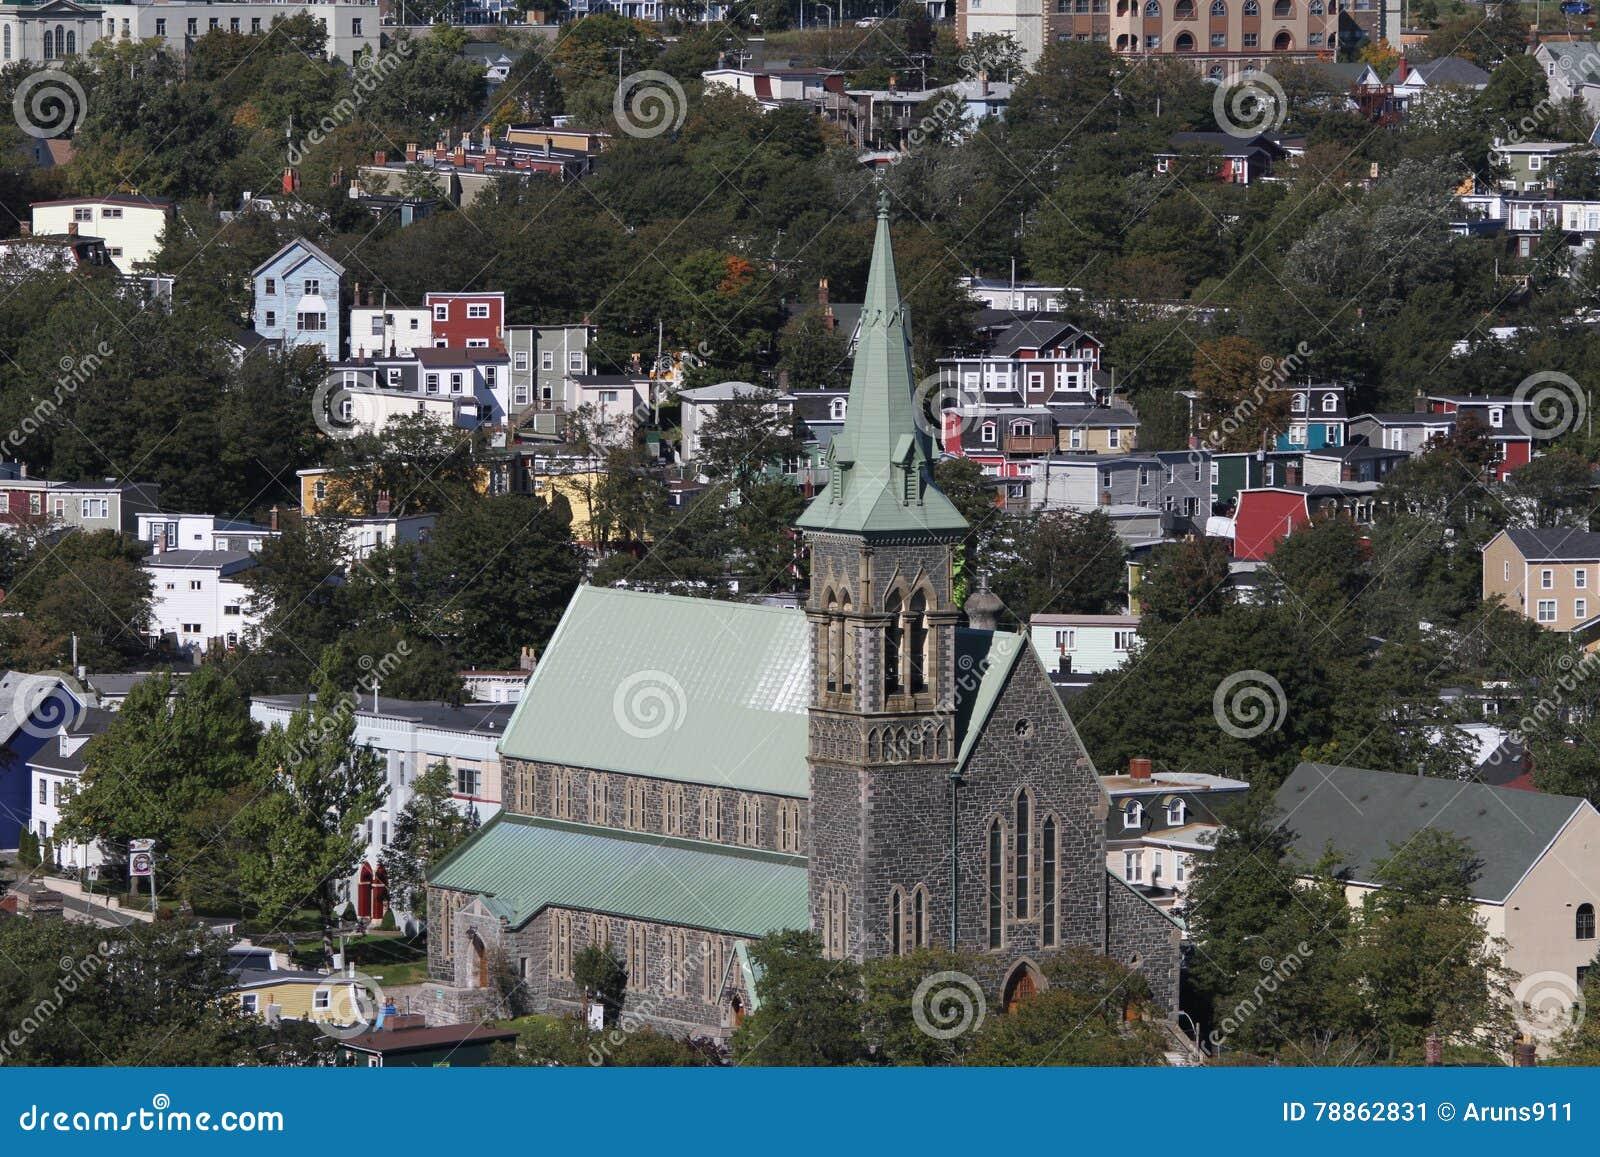 St Johns, New Foundland, Canada